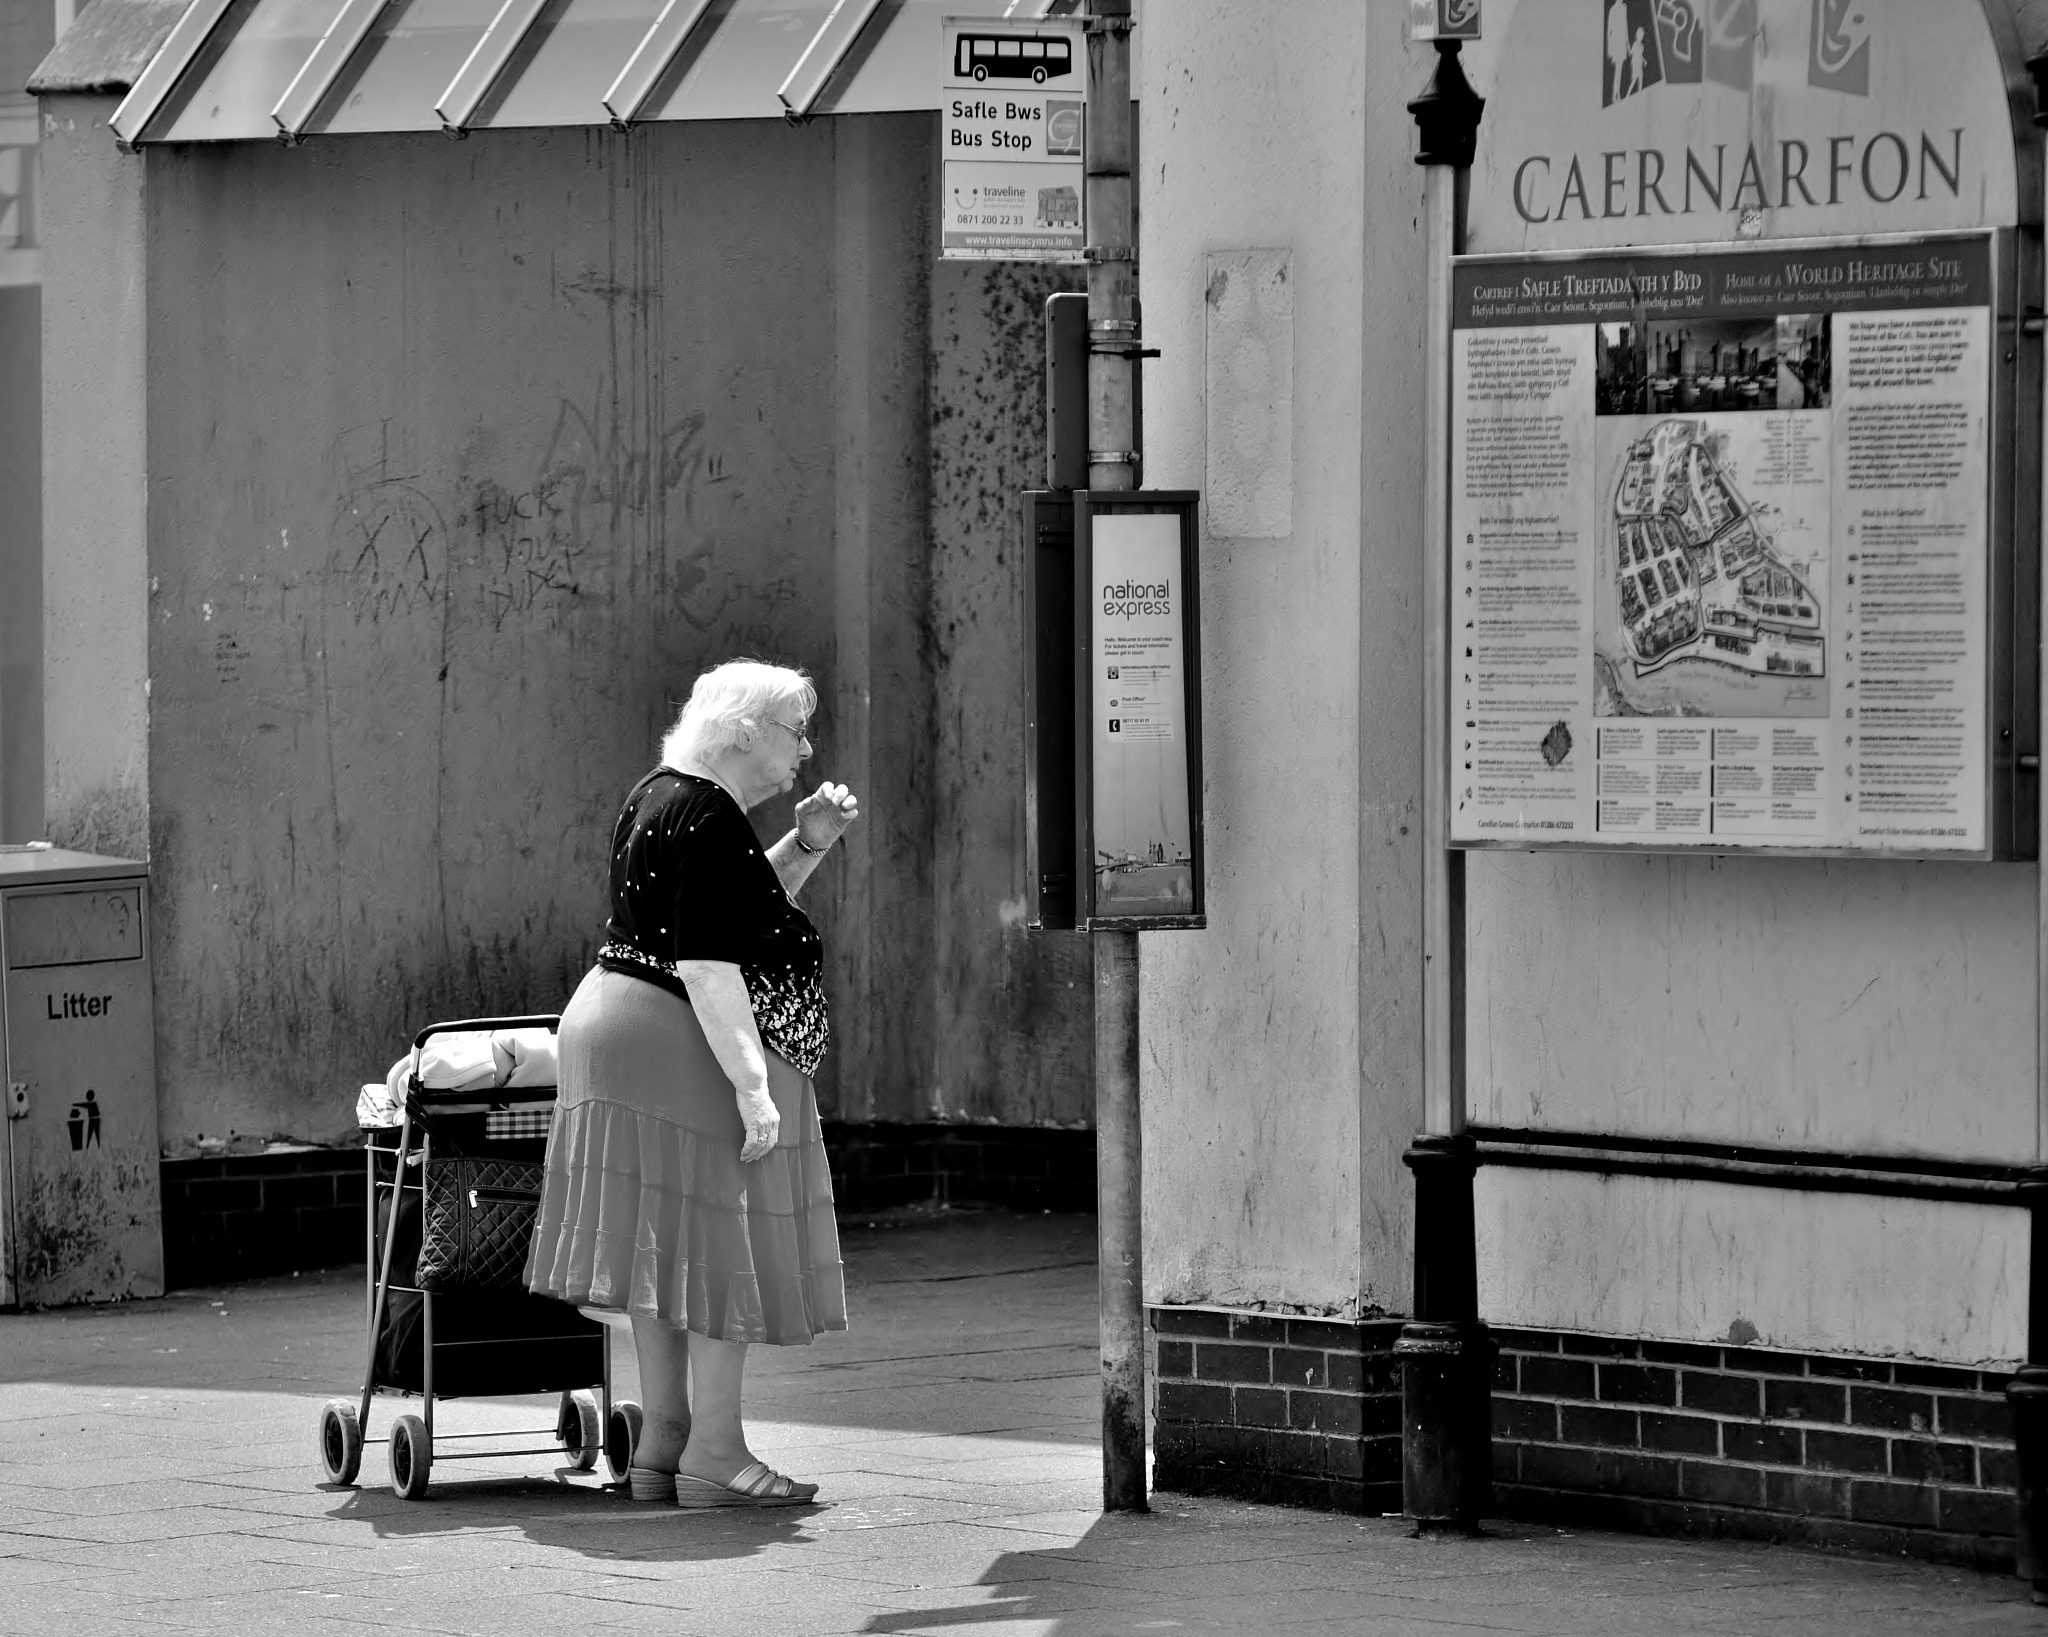 Older Woman At A Bus Stop - Caernarfon - Monochrome by paul.hosker